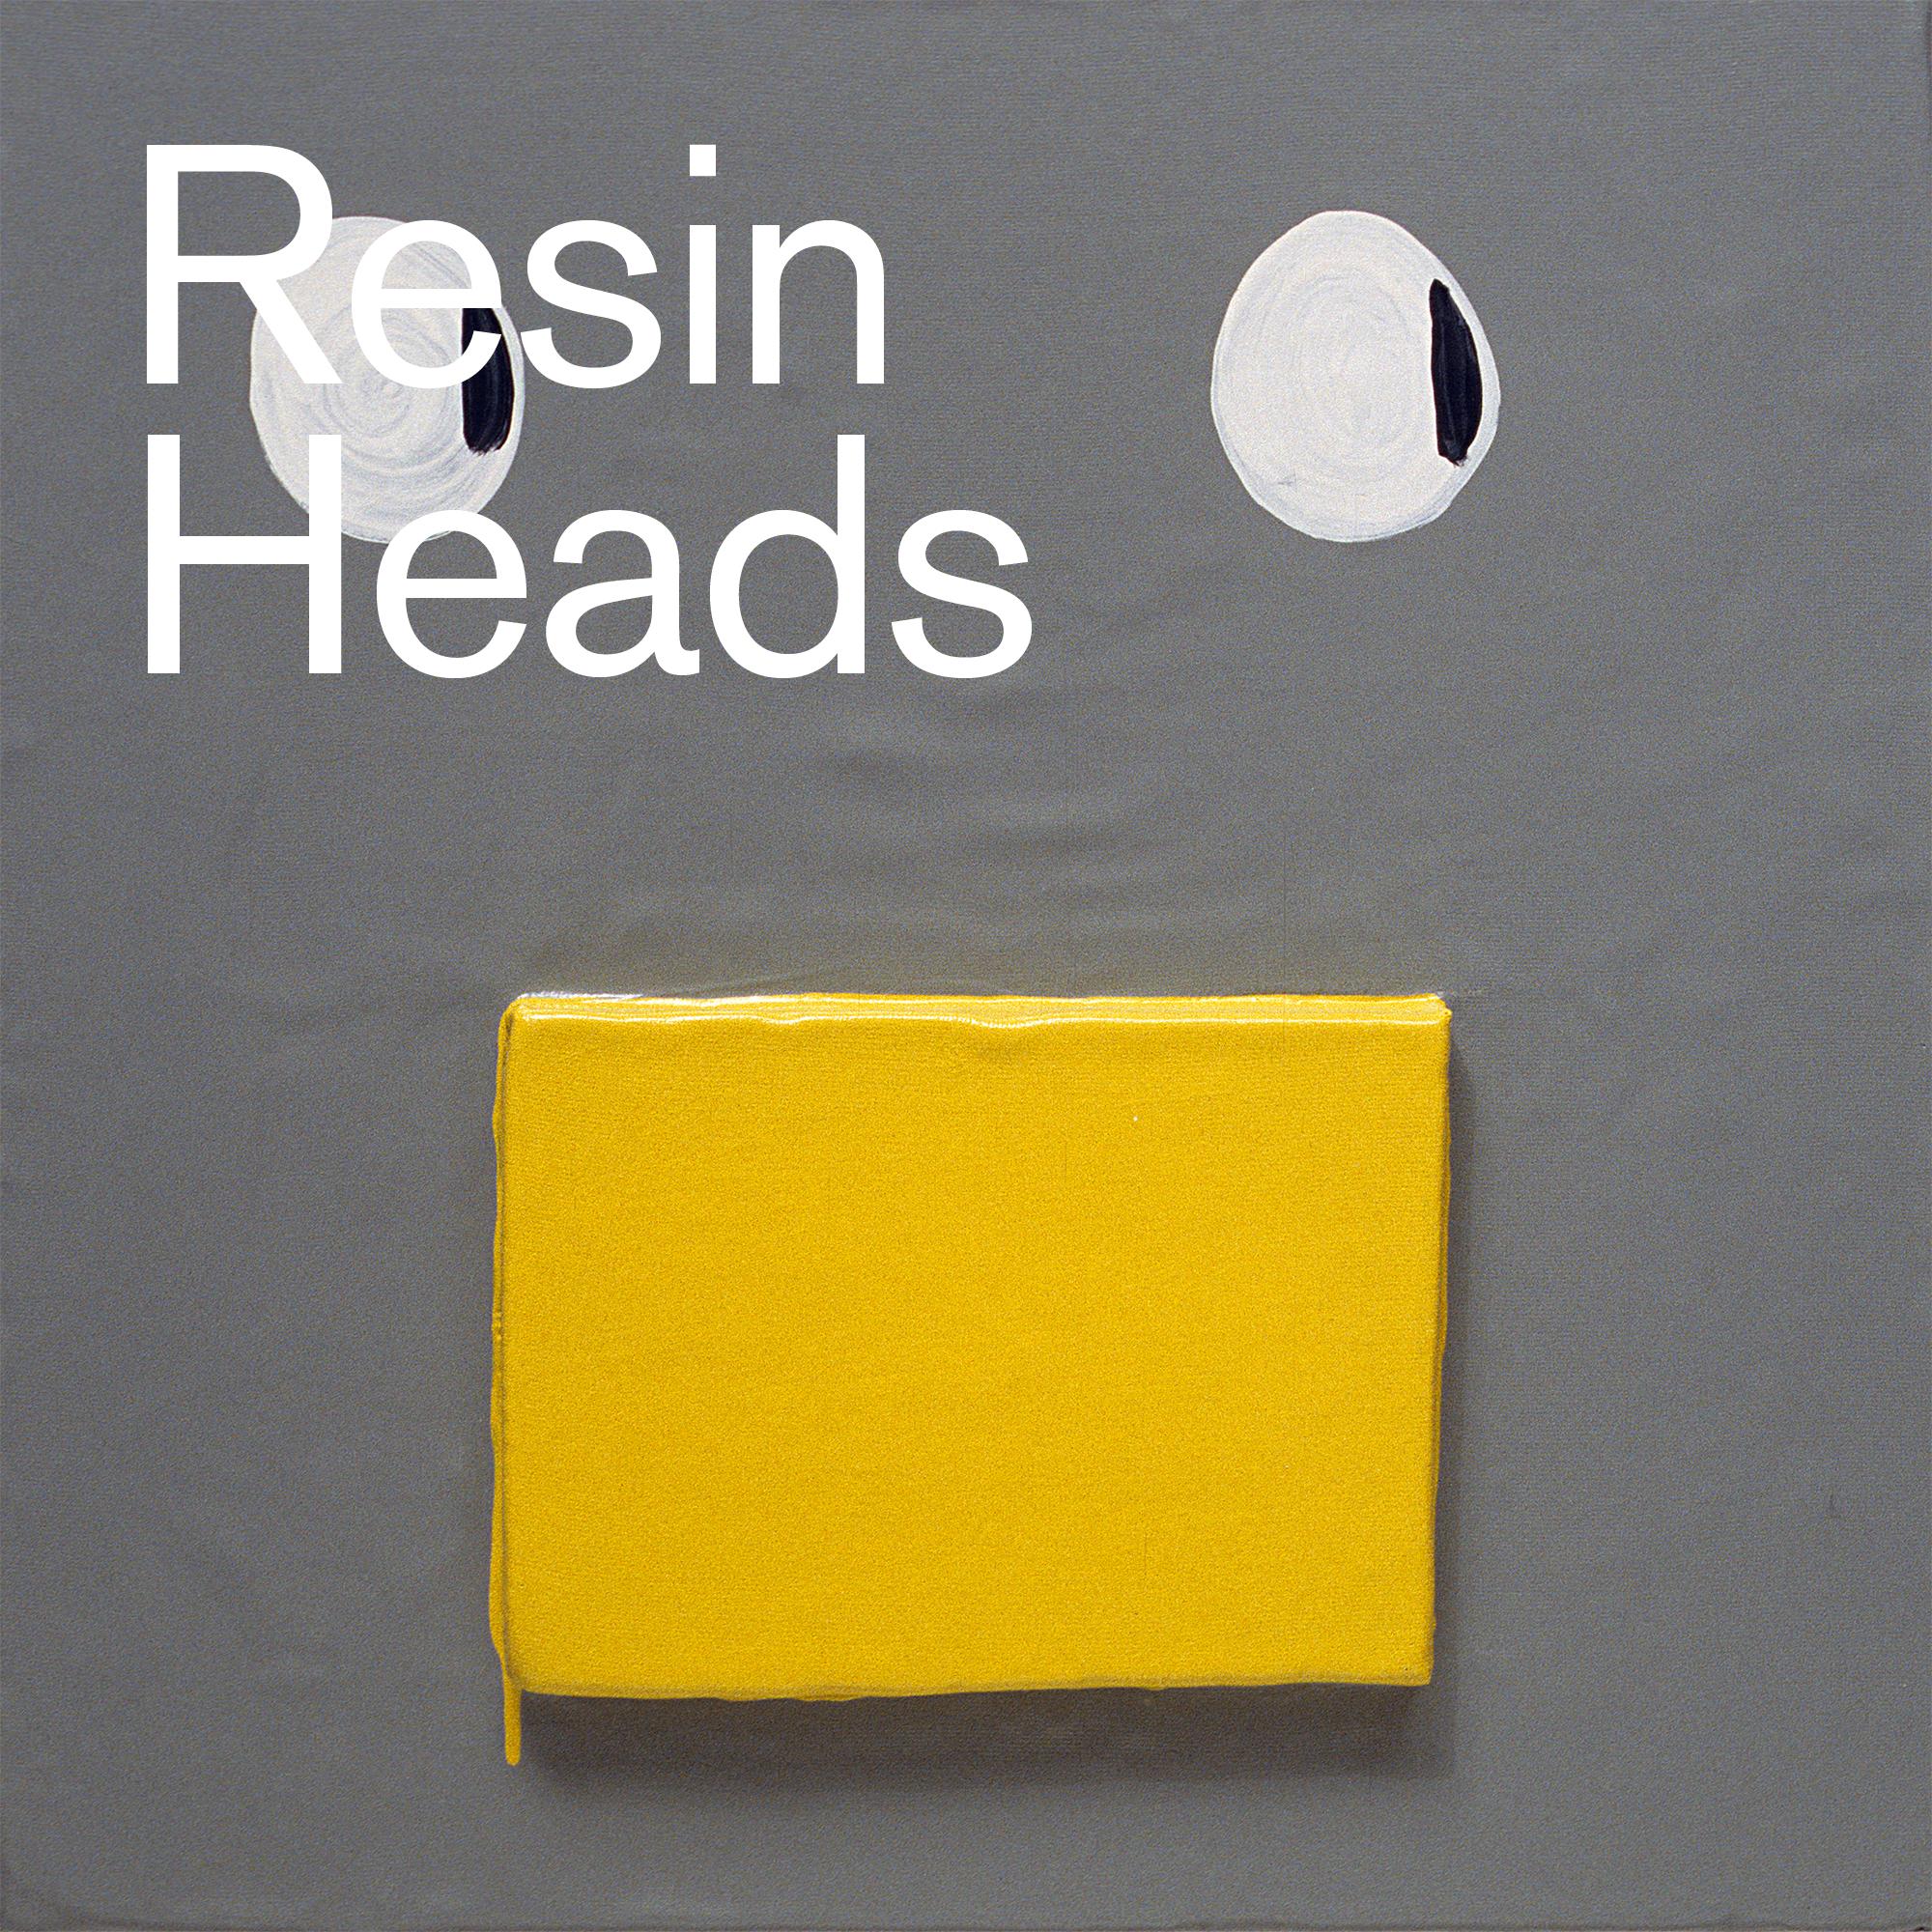 Resin Heads